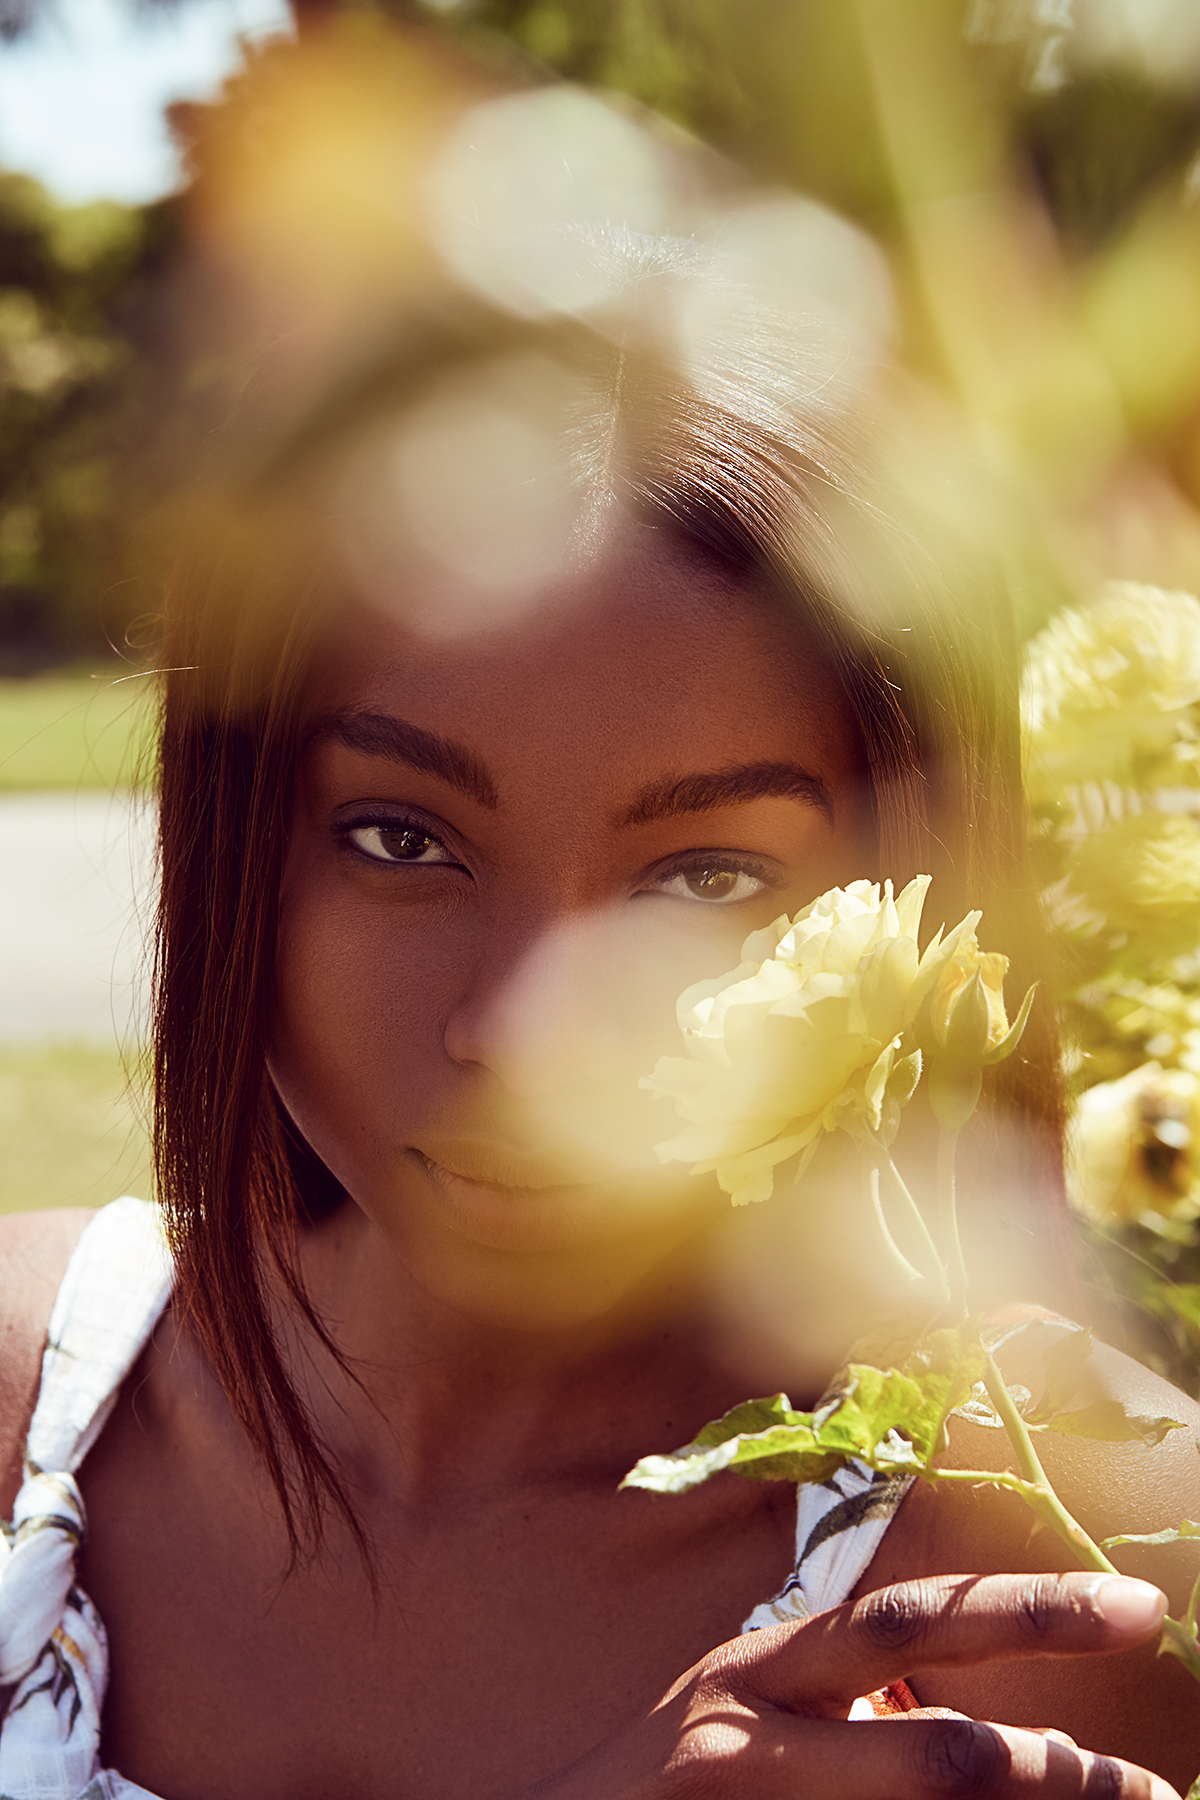 Natasha Ndlovu_Regent's Park_3F8A2838_WEB